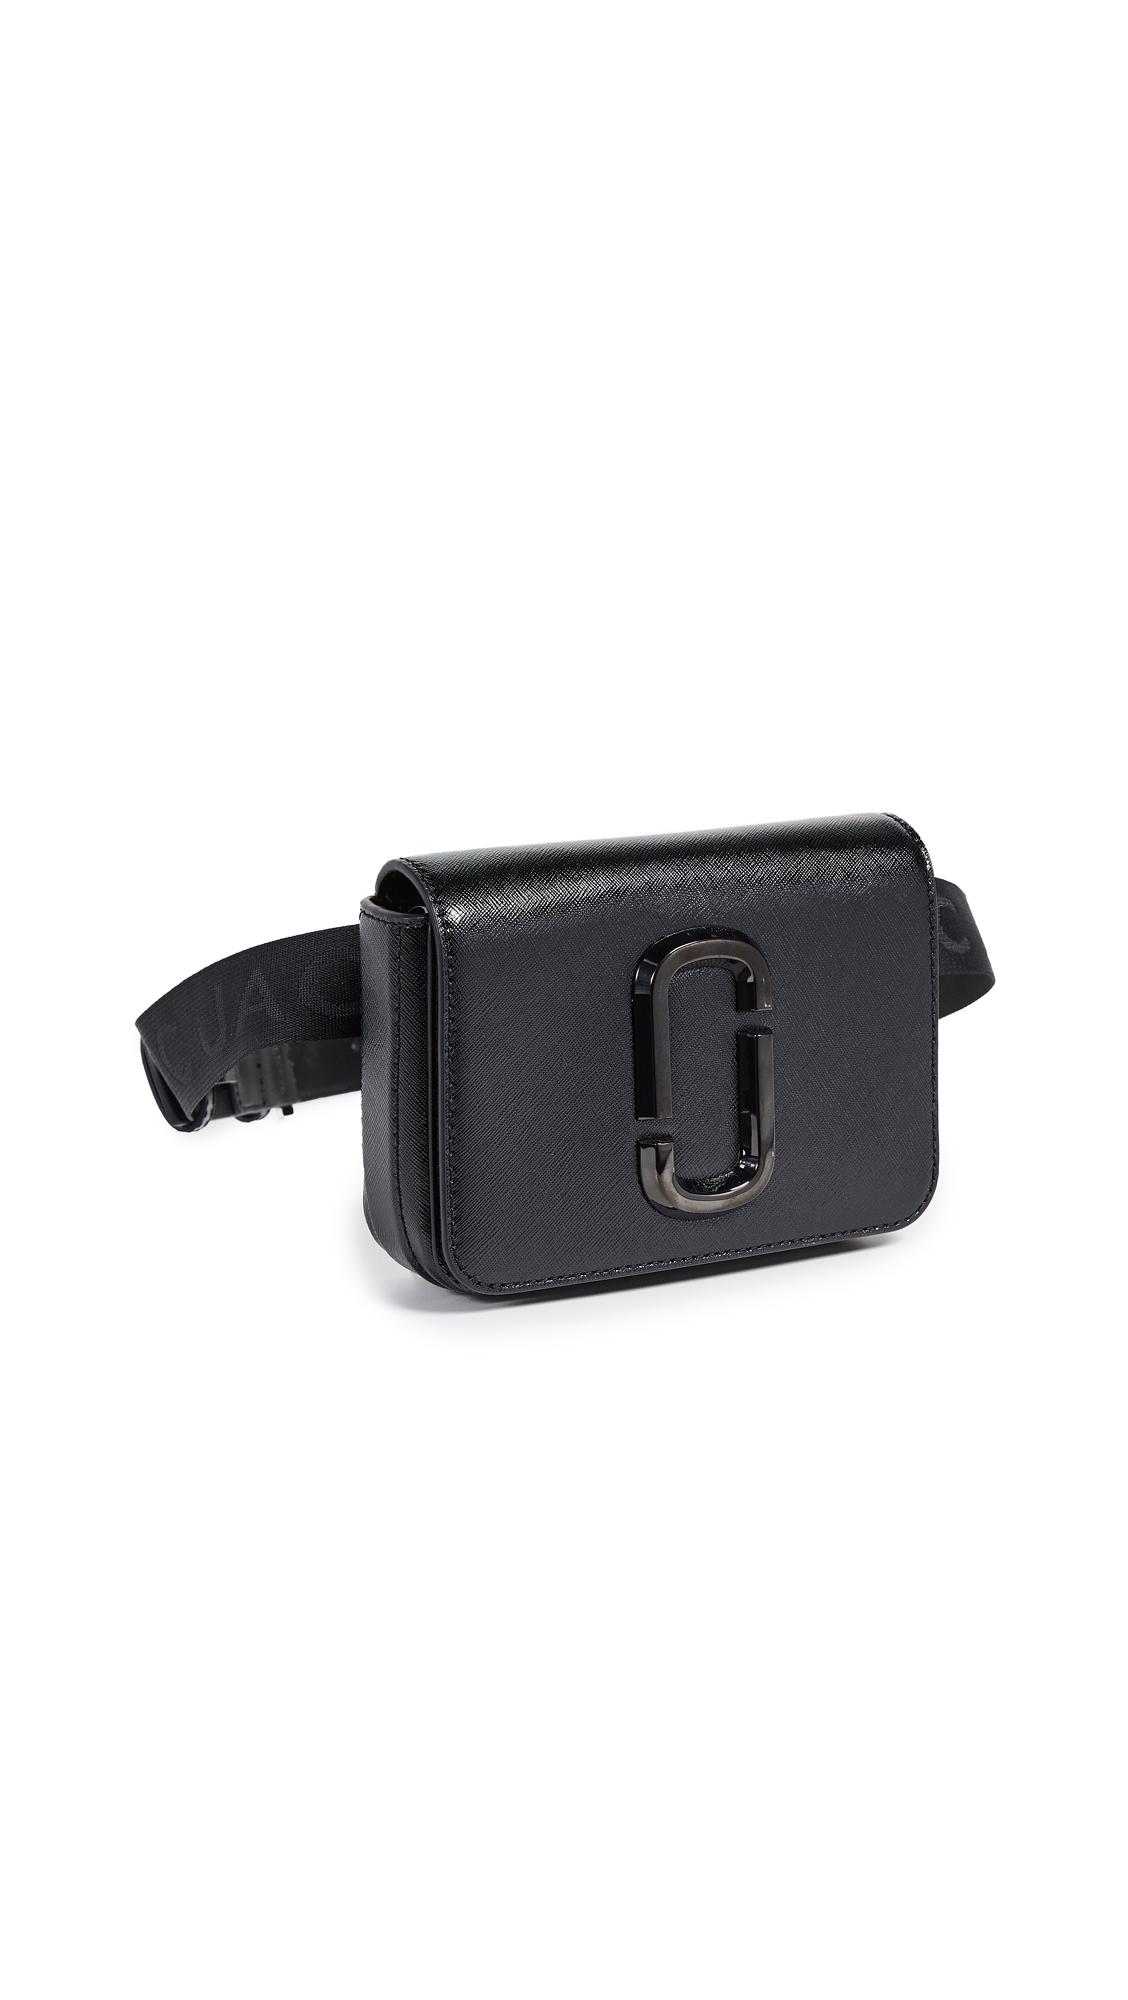 The Marc Jacobs XS/S Hip Shot DTM Belt Bag